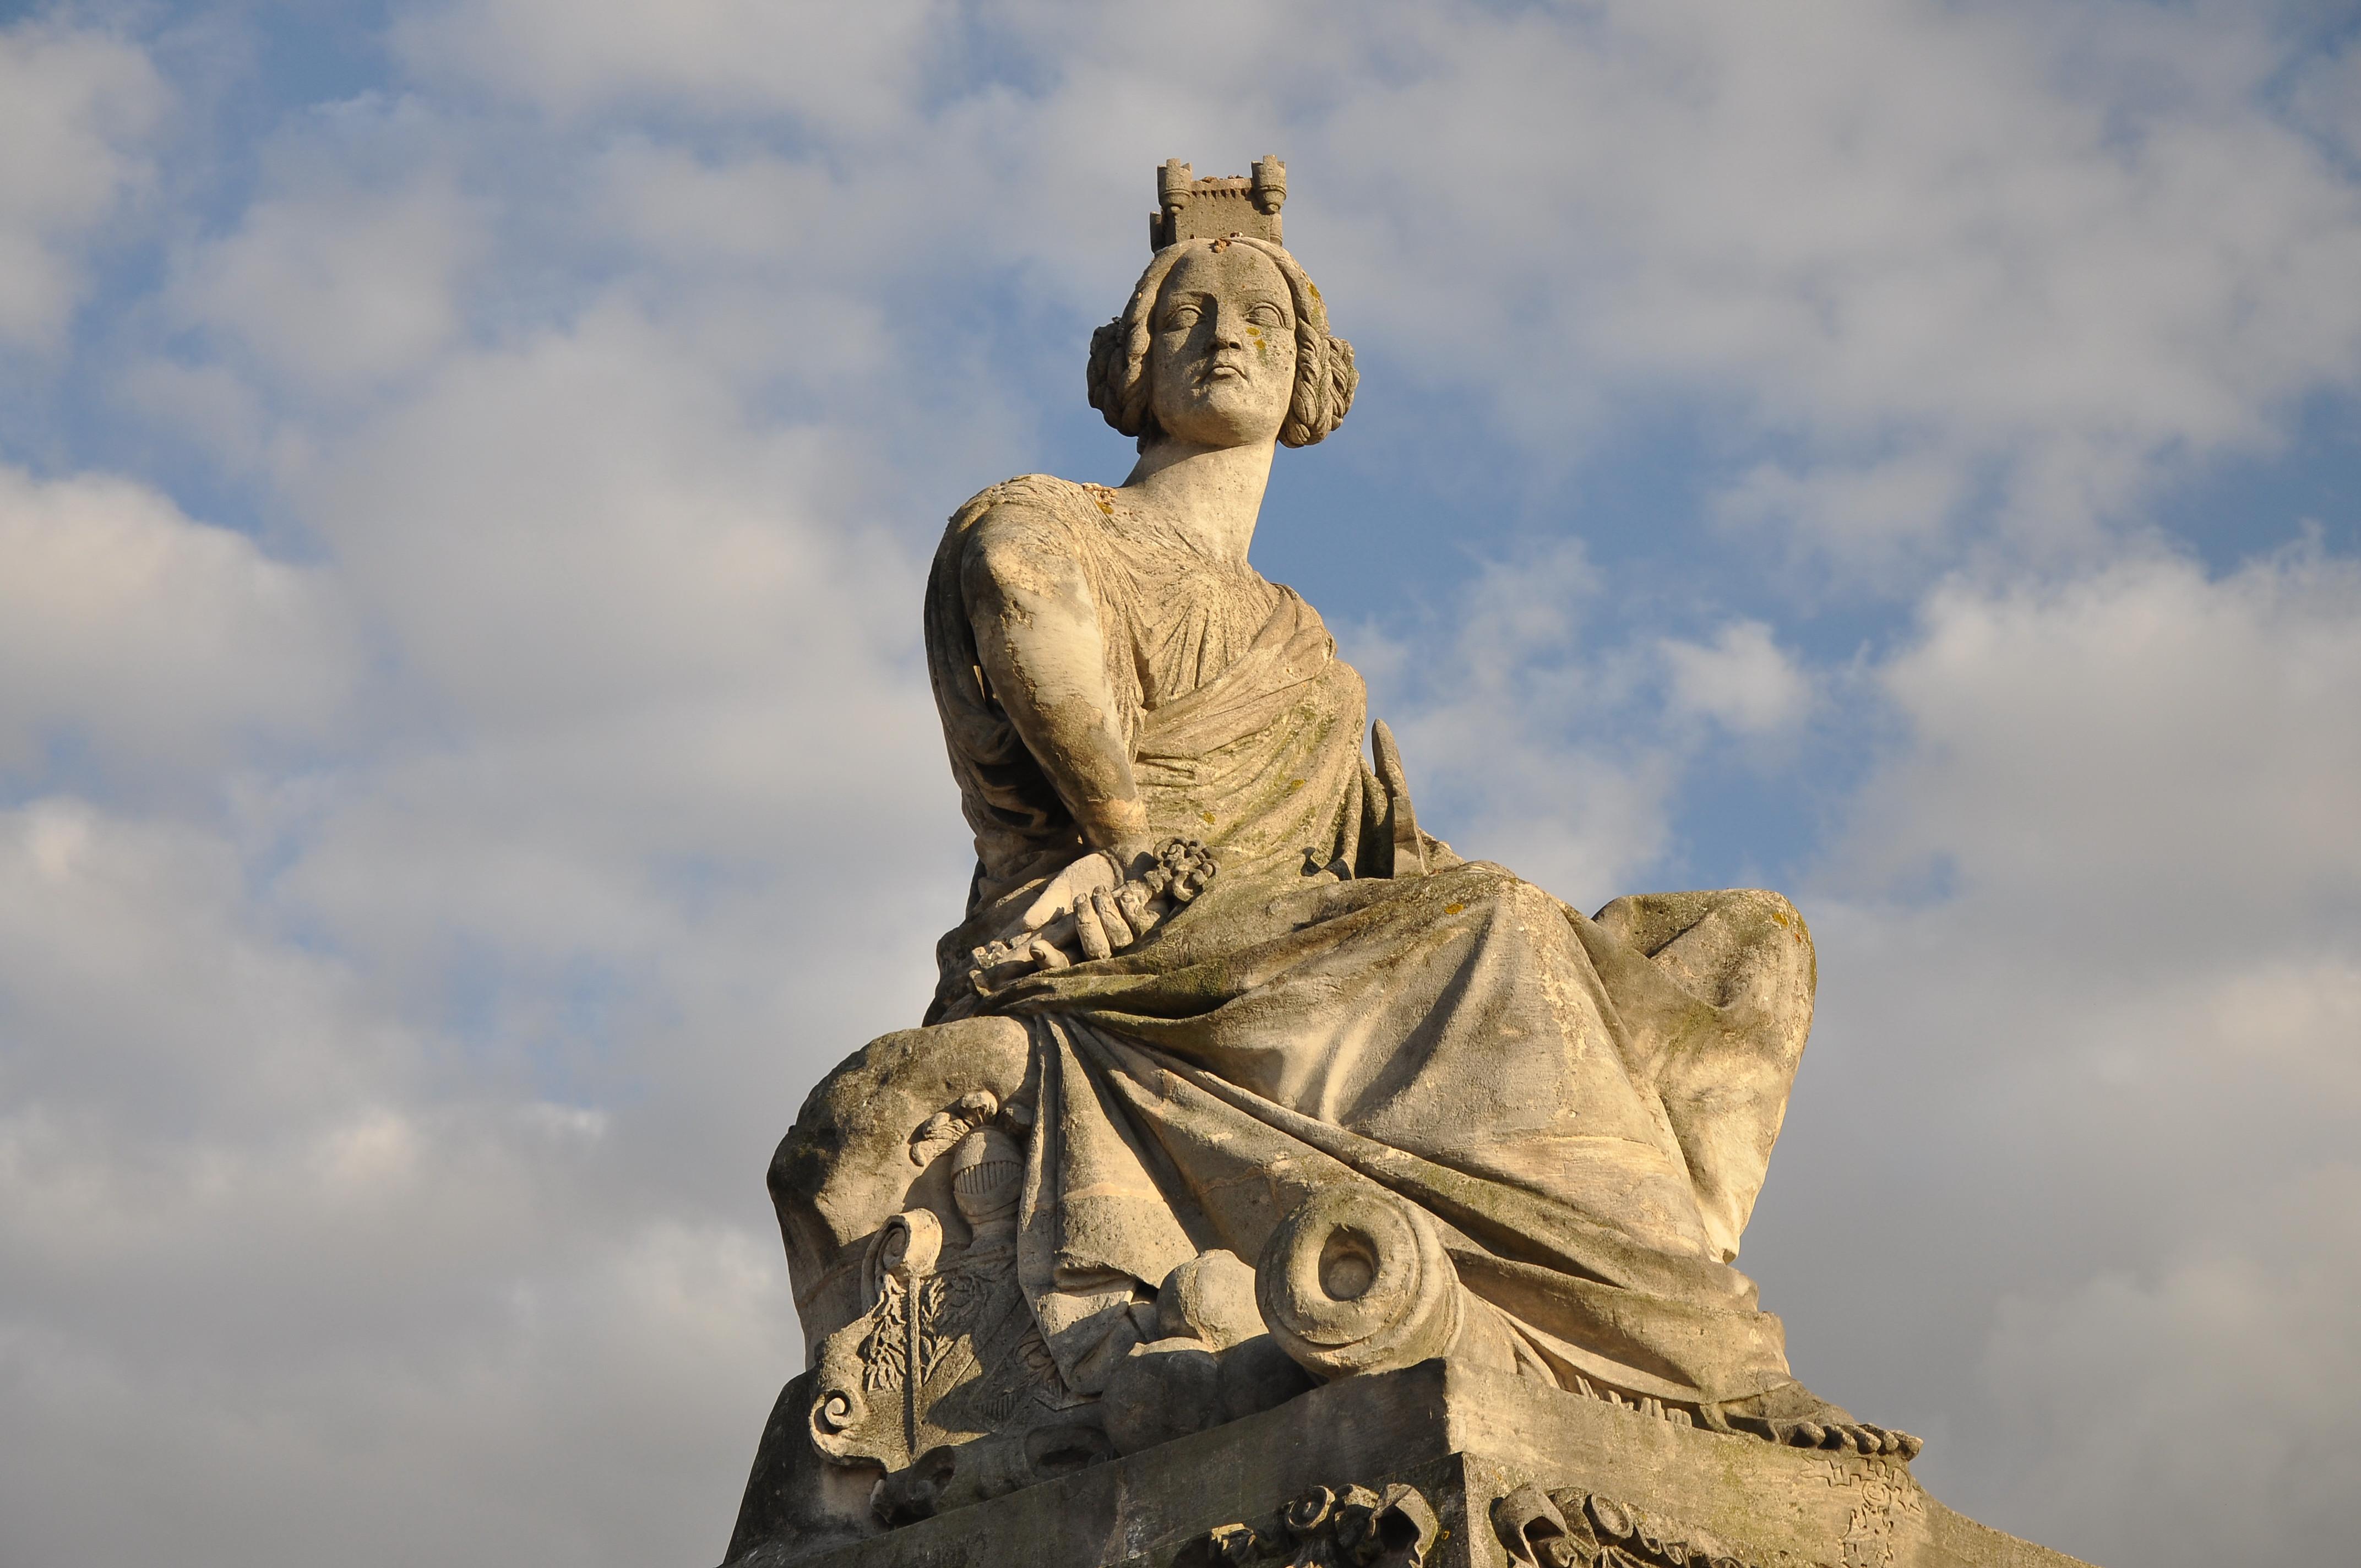 Bild: File:Statue of Strasbourg on place de la Concorde 003.JPG ...